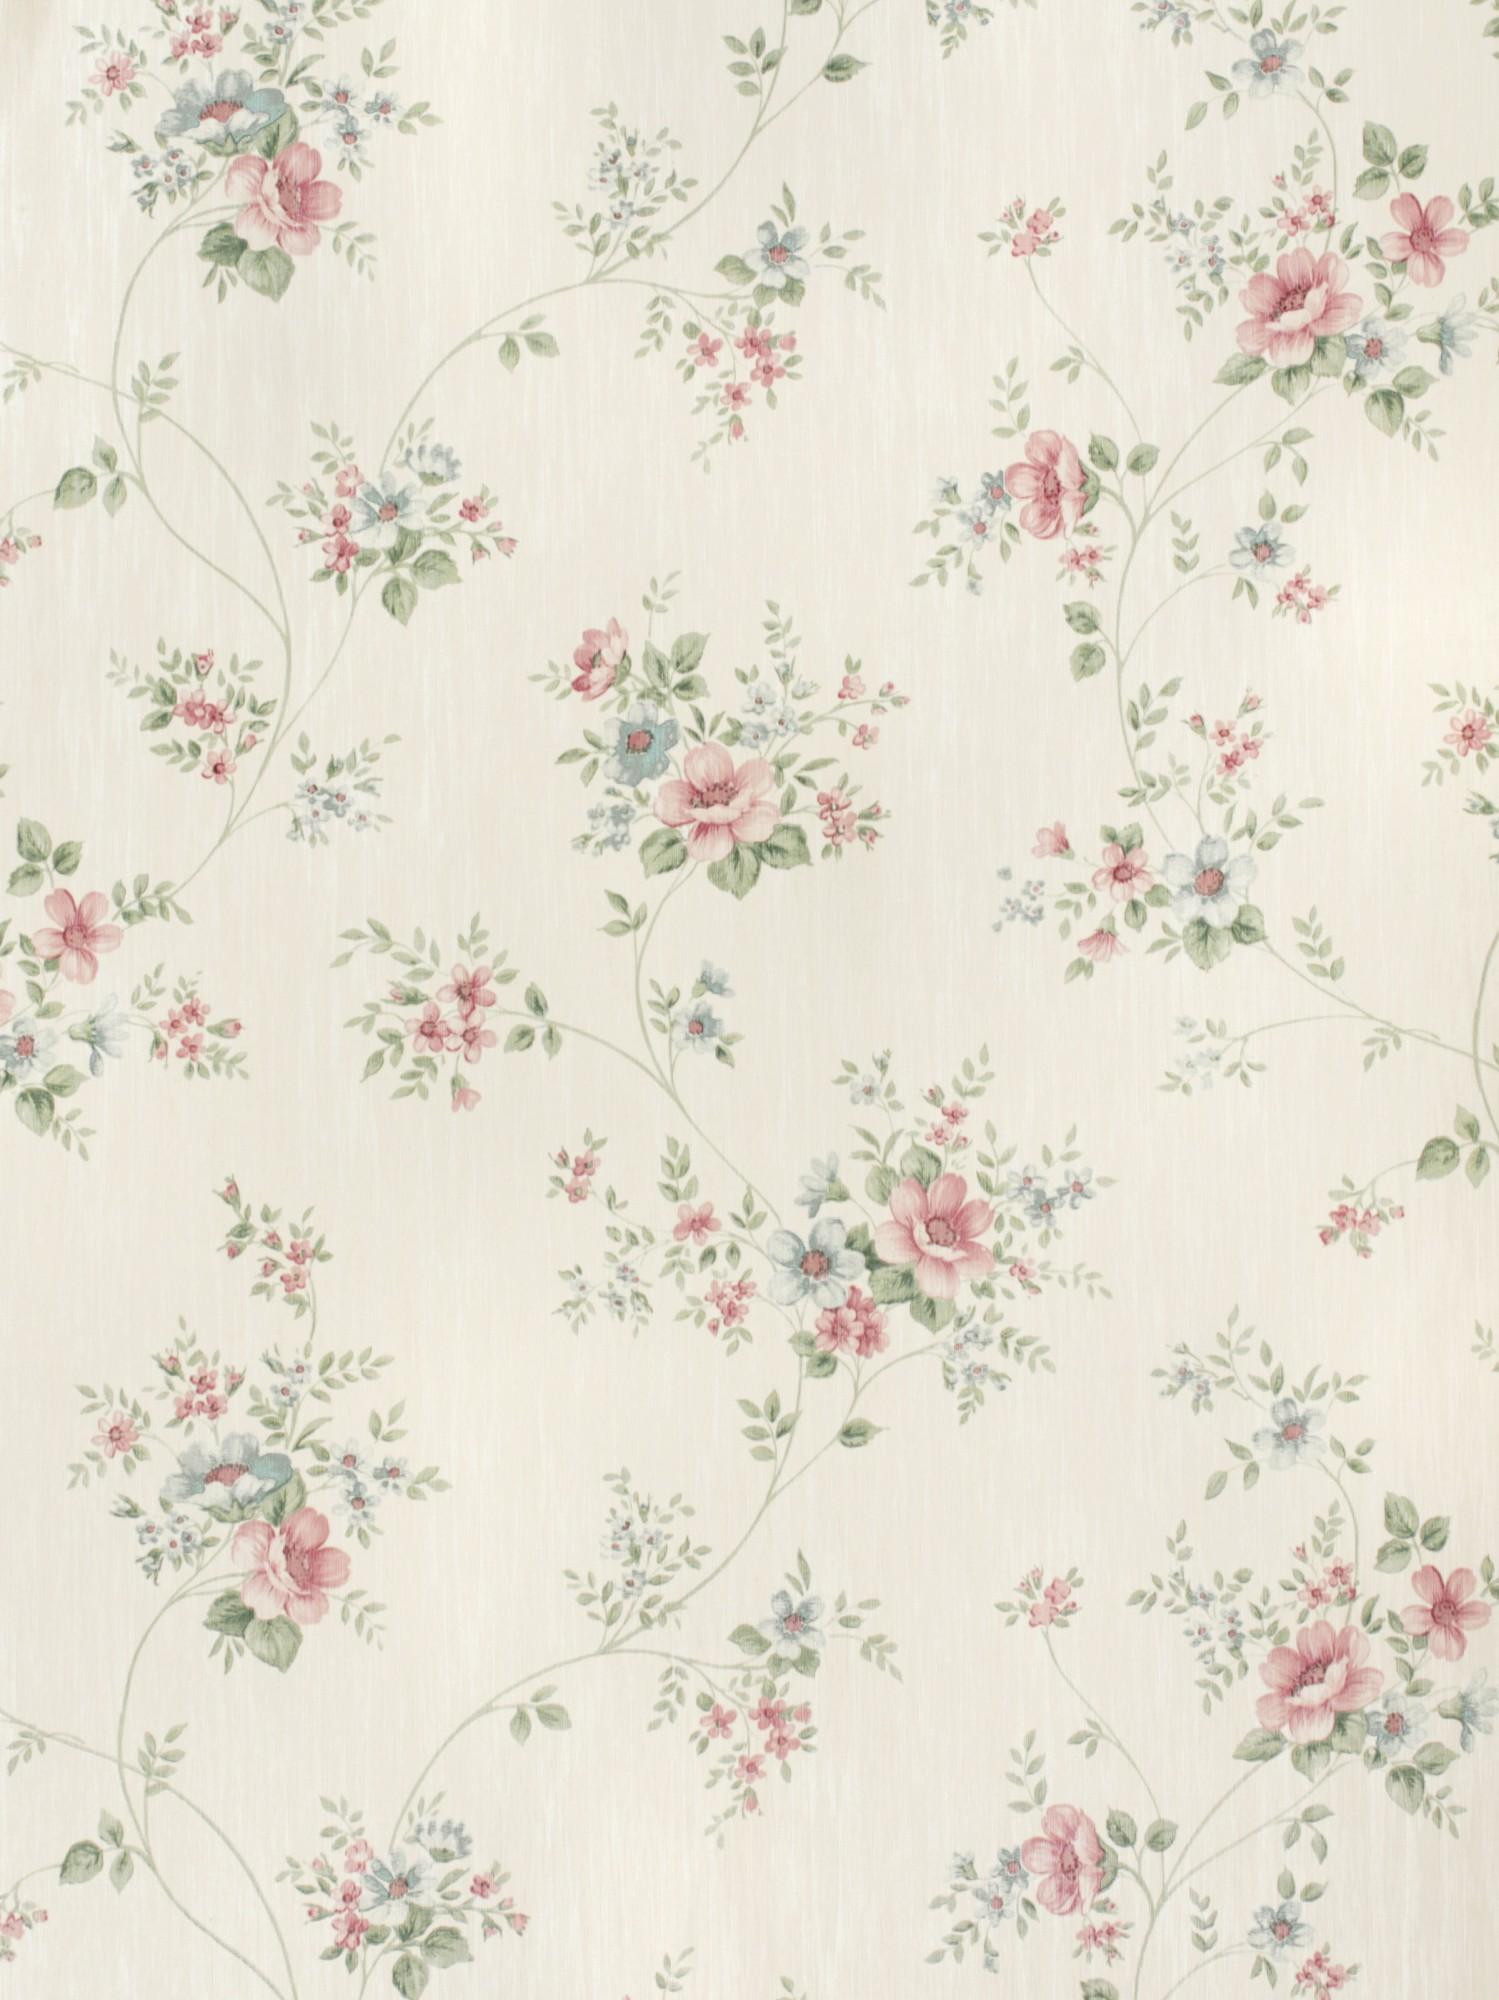 country charm tapete rasch textil satintapete landhaus 298429 rosen rosa blau 2 ebay. Black Bedroom Furniture Sets. Home Design Ideas